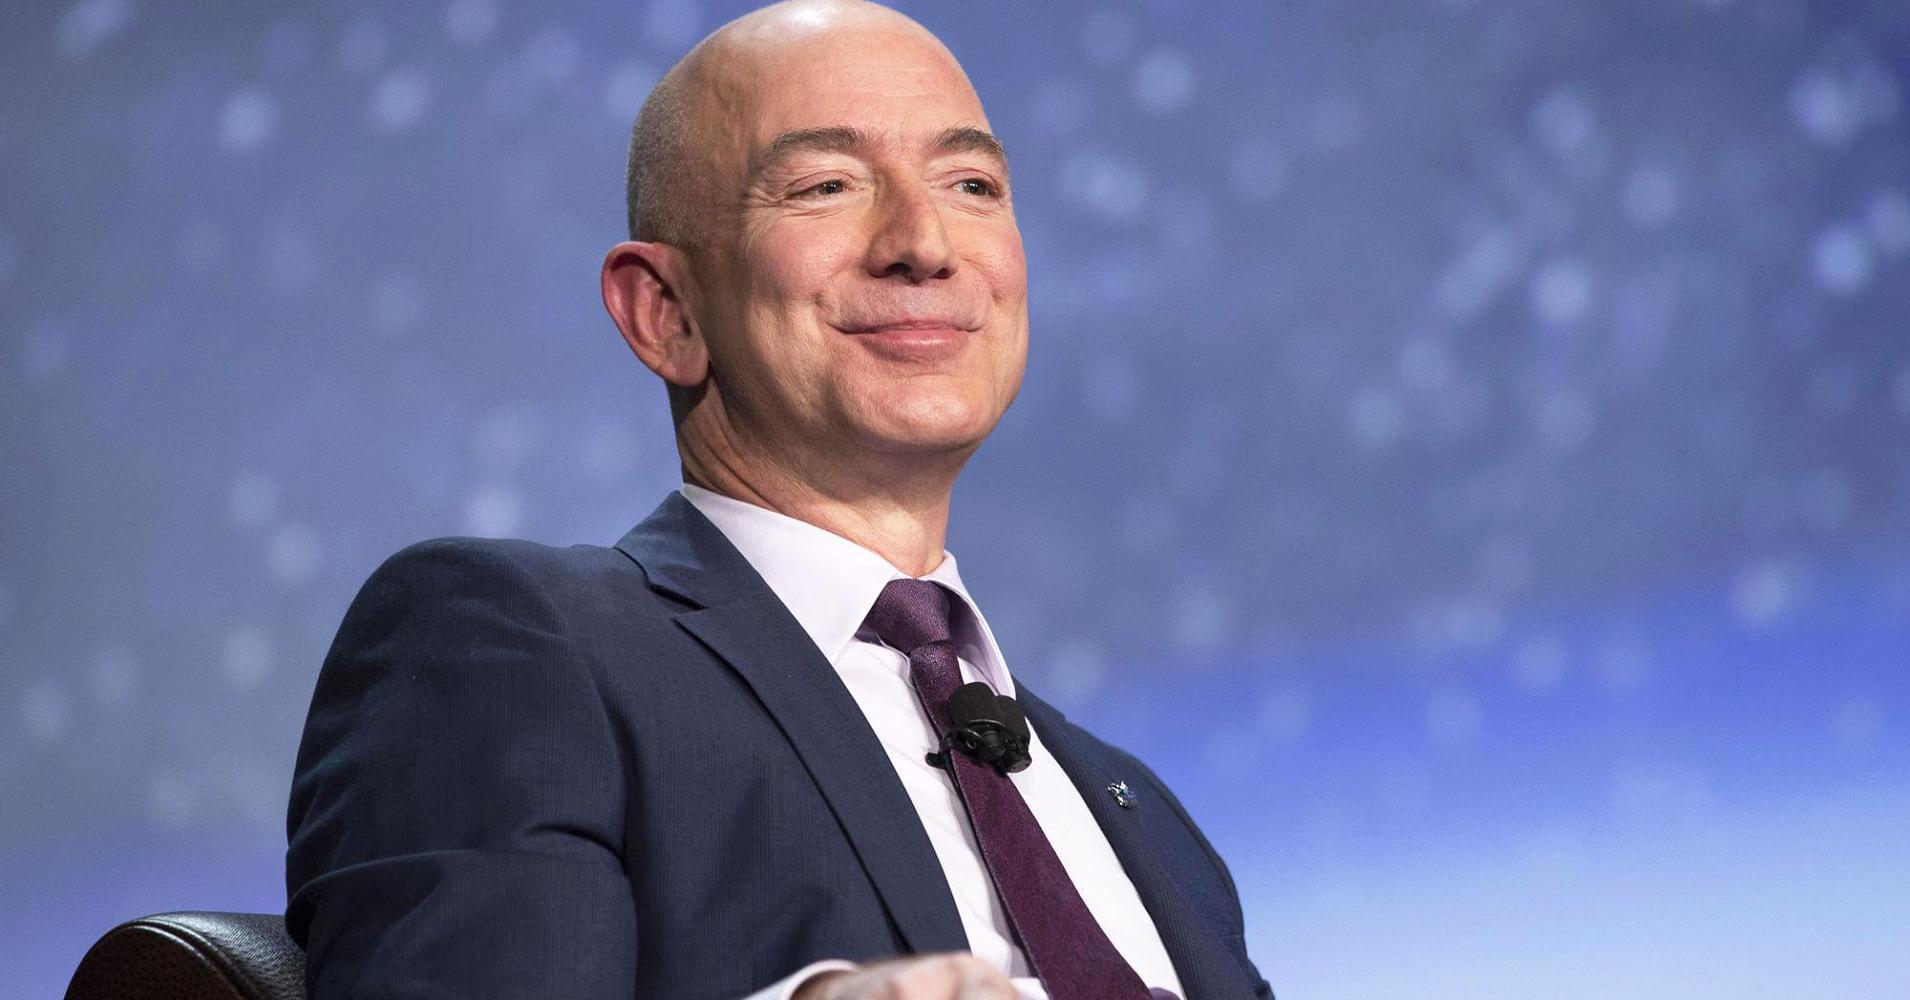 Amazon's Jeff Bezos wealth hits $105.1 billion